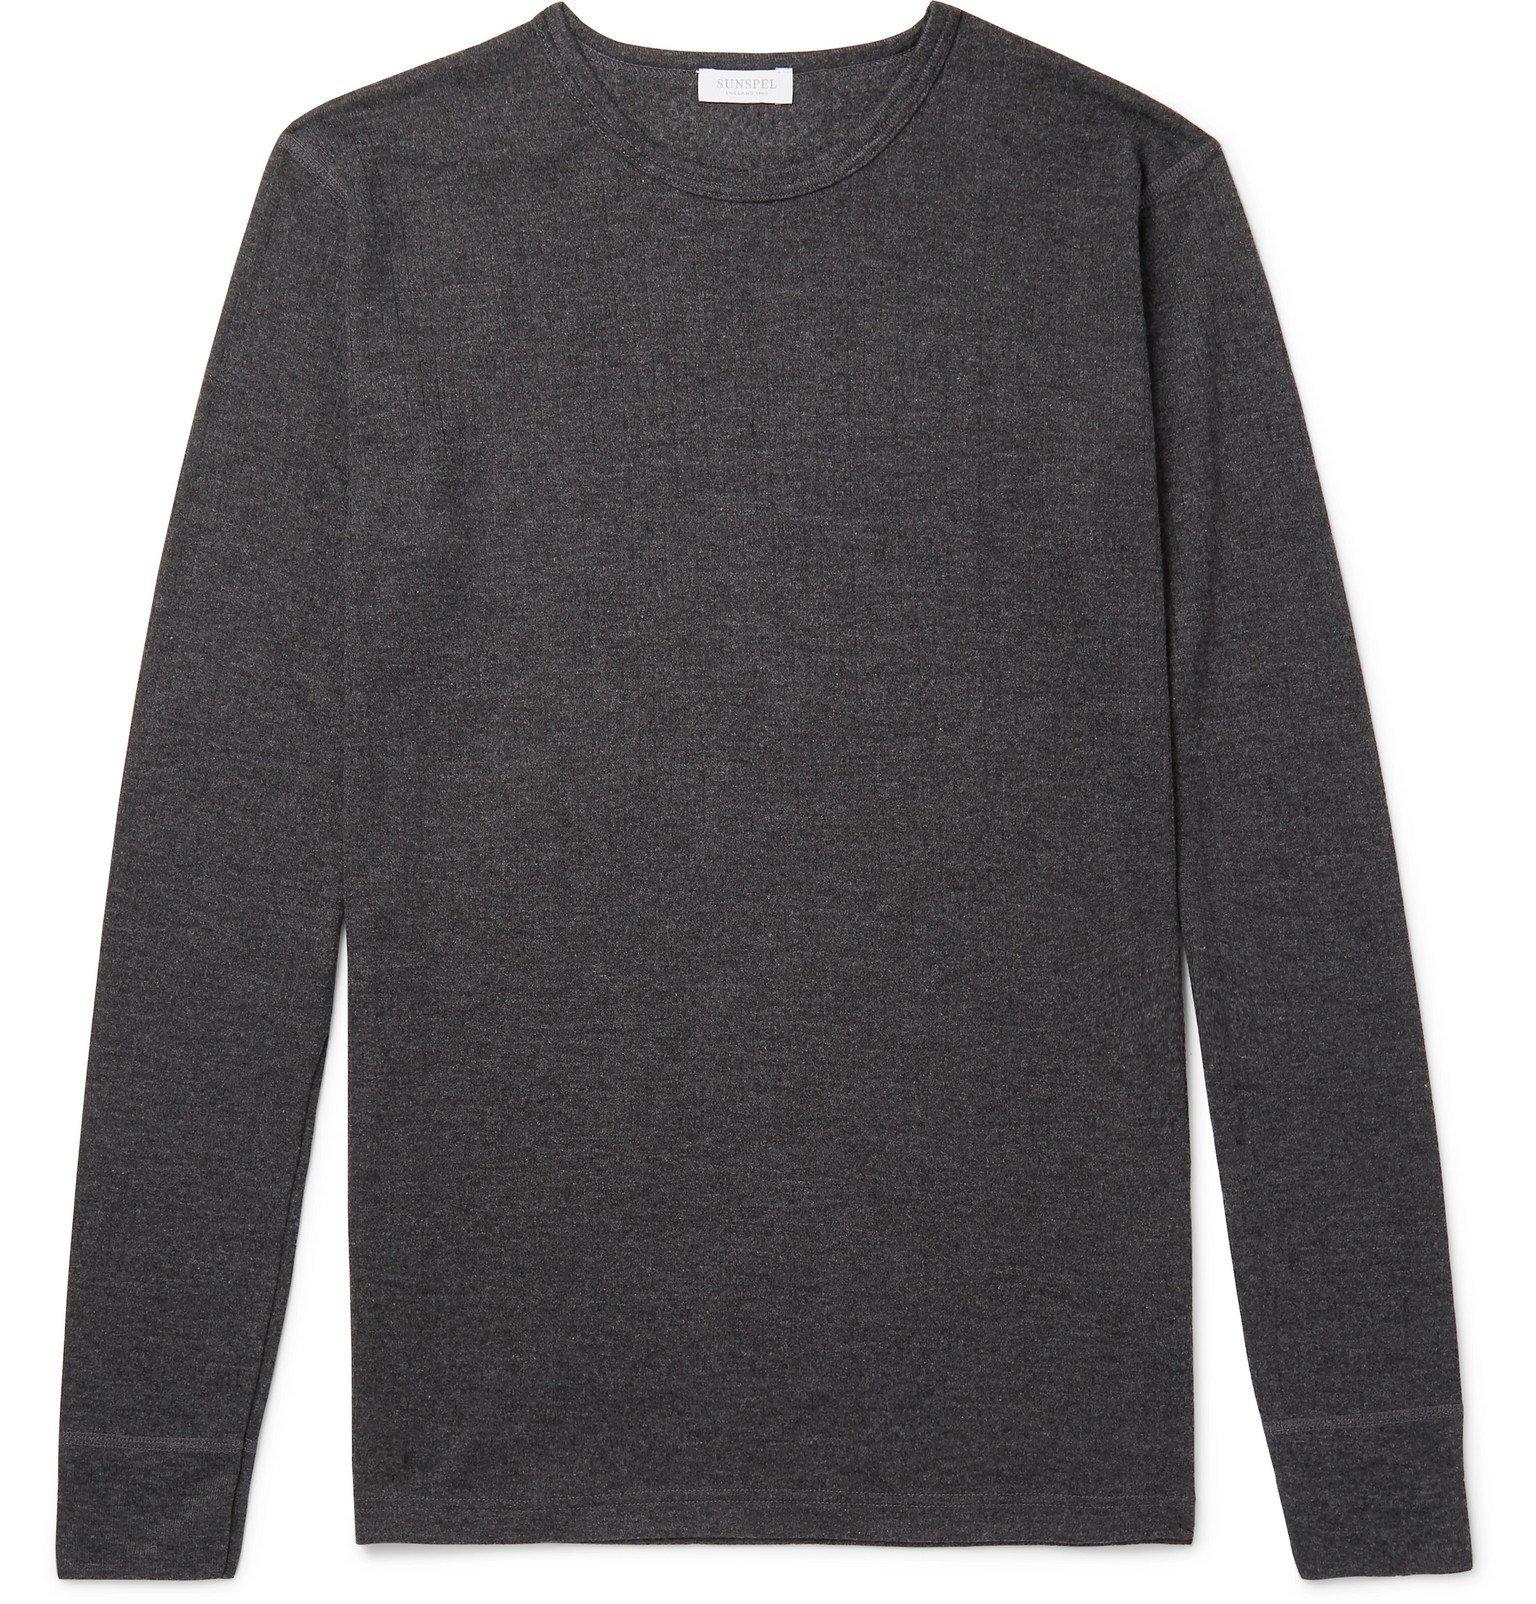 Sunspel - Thermal Jersey Pyjama T-Shirt - Gray